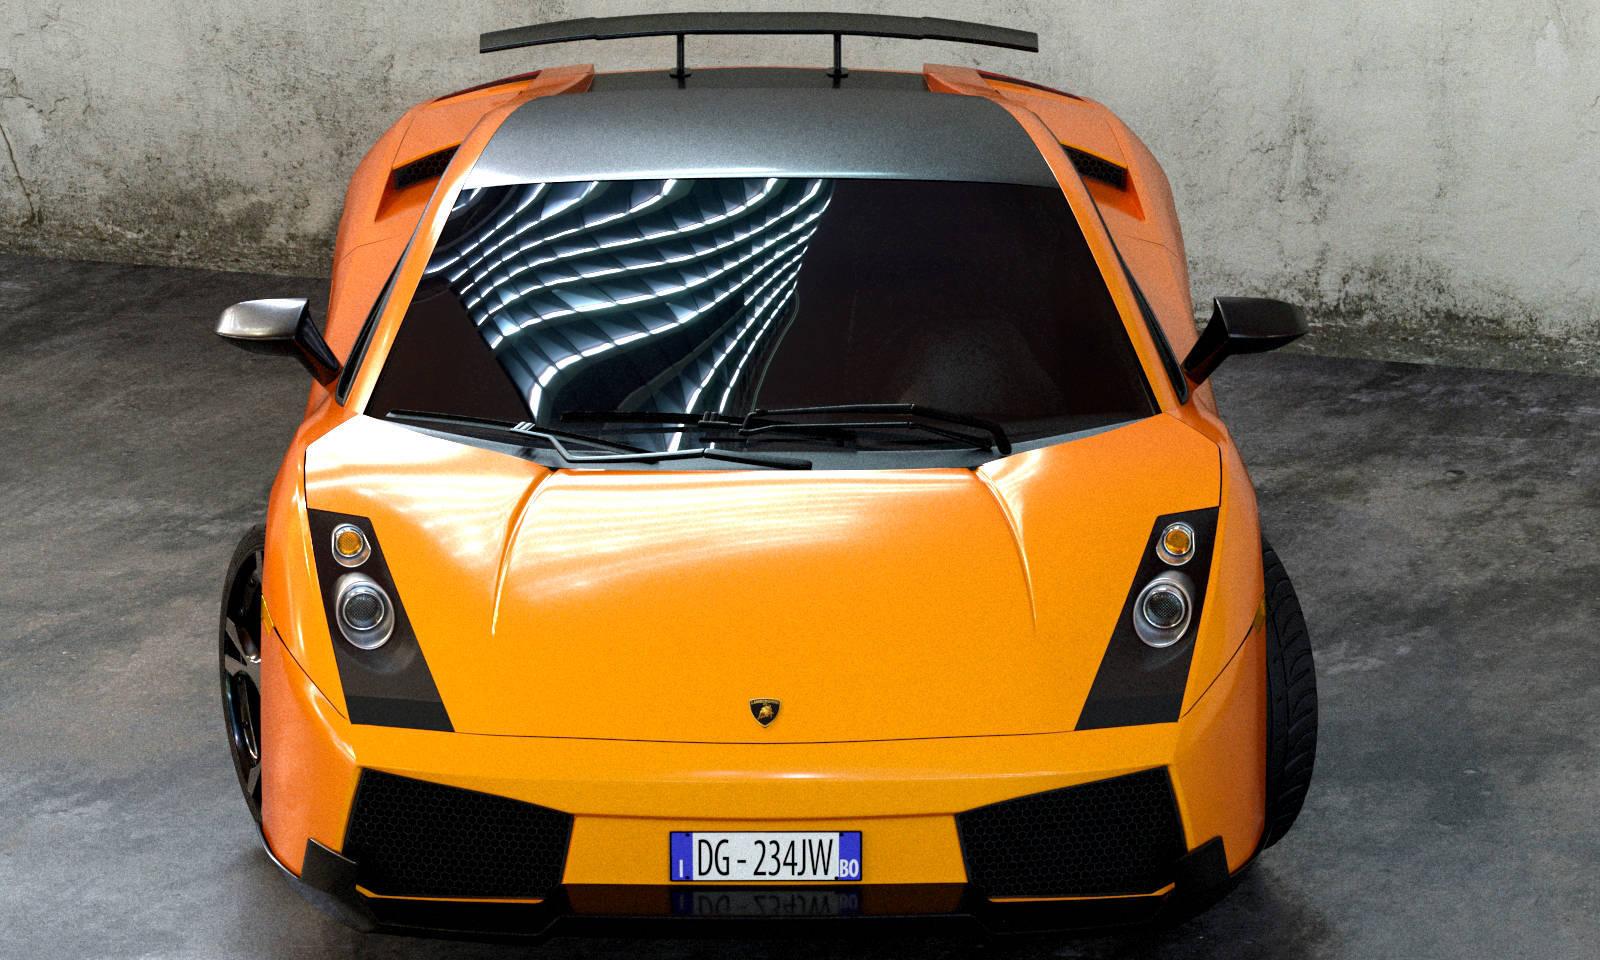 Modelo Lamborghini Gallardo 2003 Na Cor Laranja Renderizada Com O  Renderizador Vray.